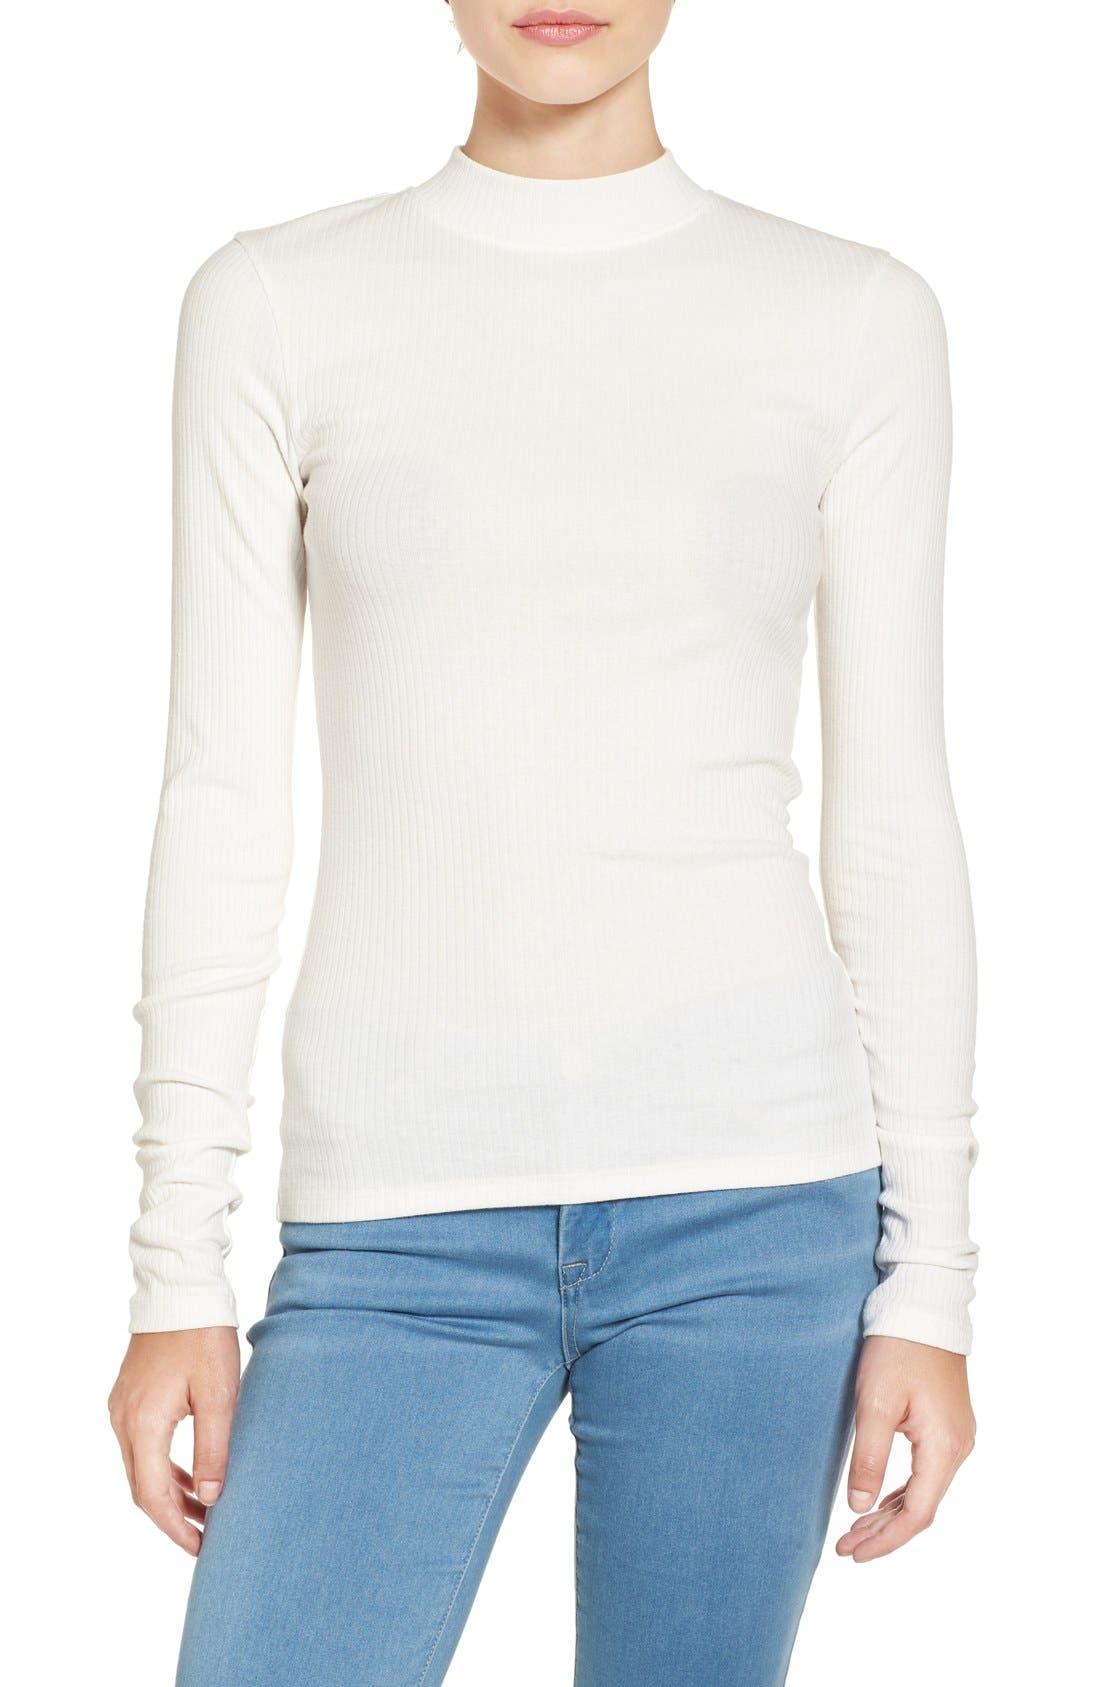 white mock-turtleneck top